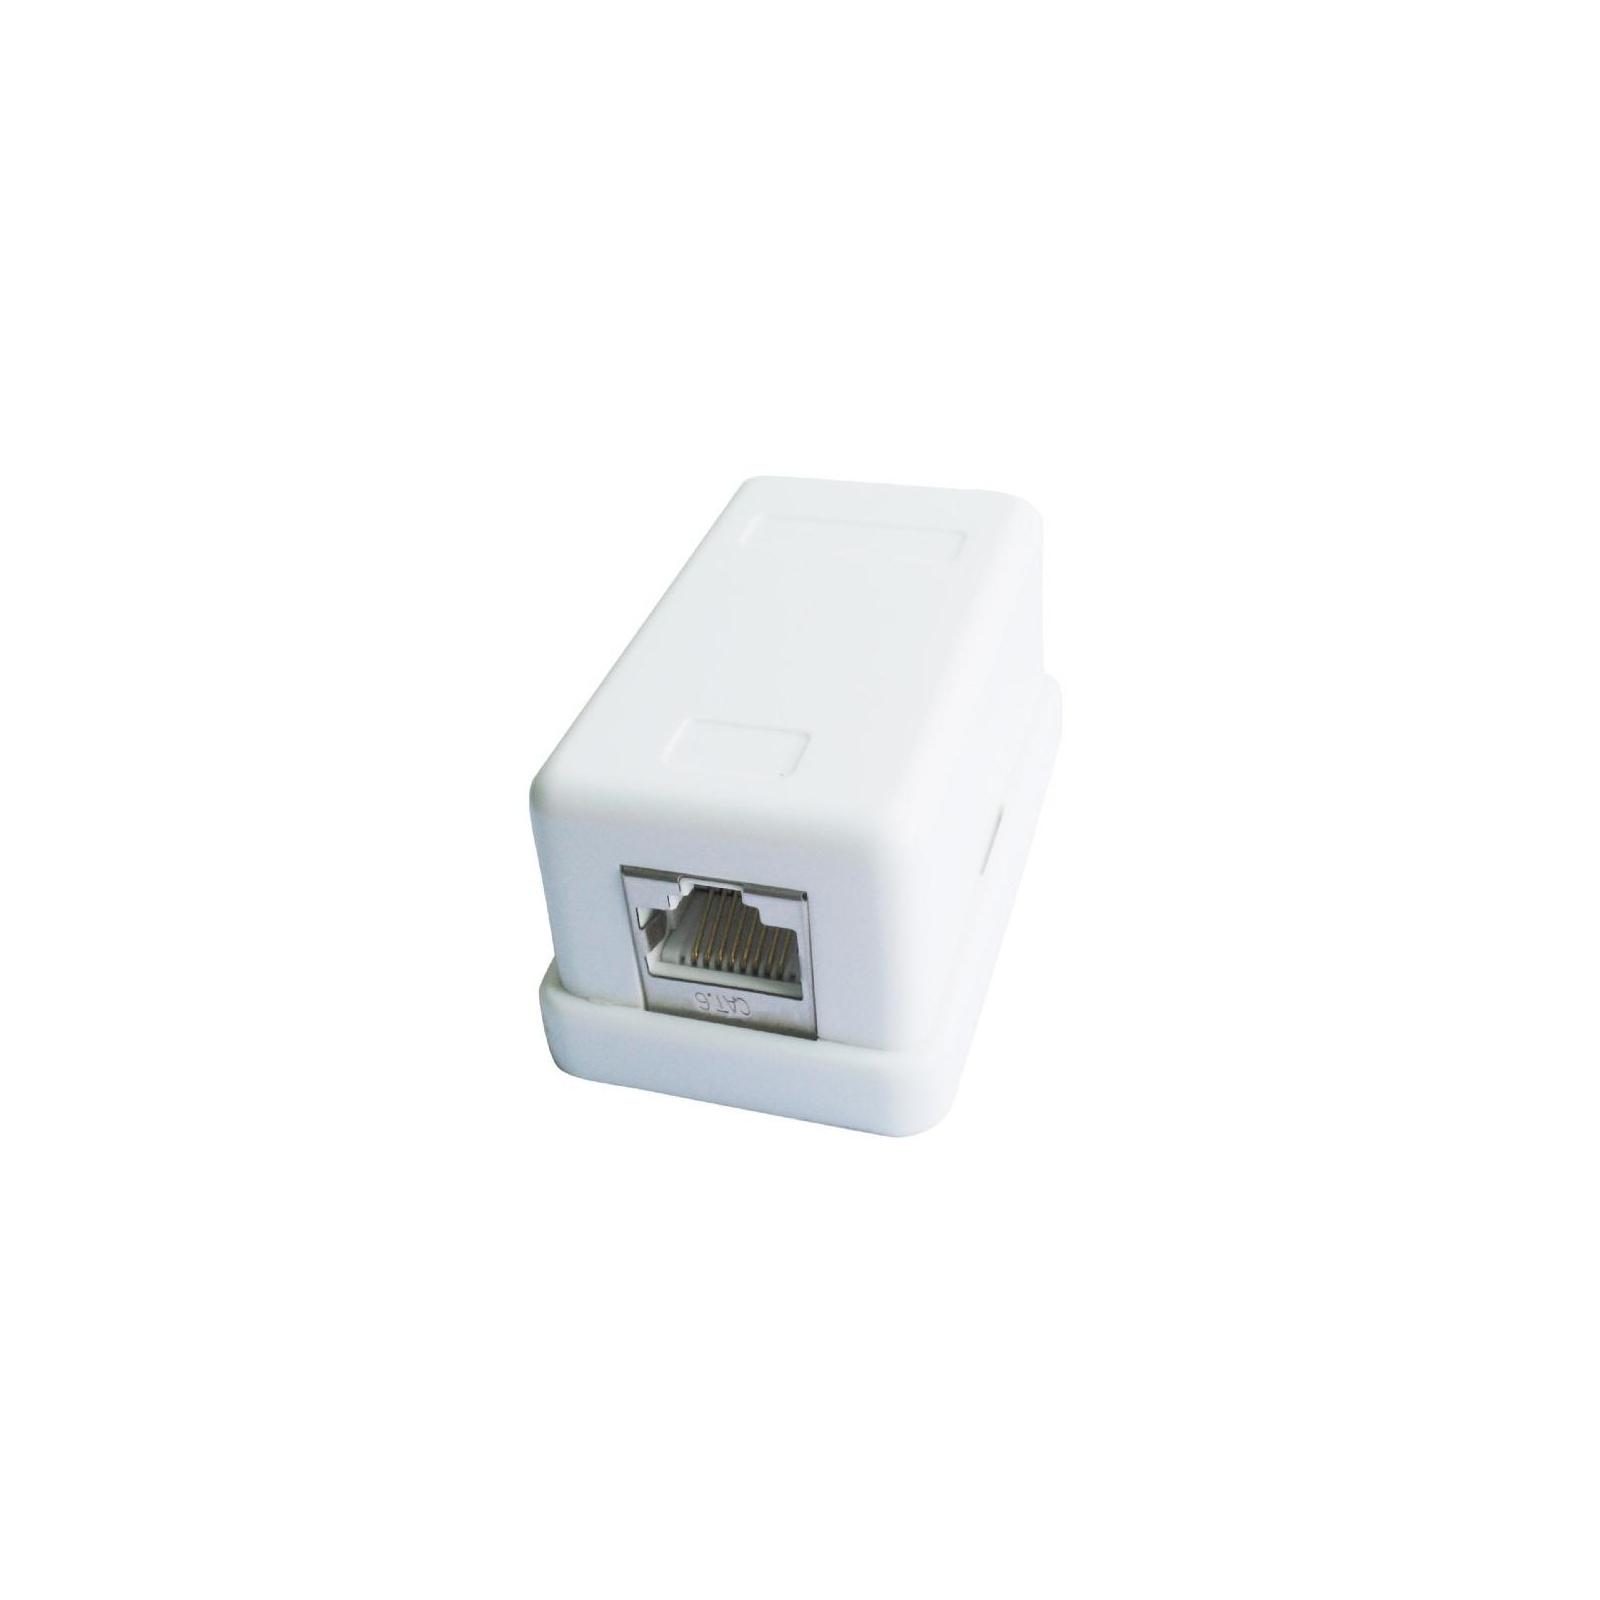 Розетка сетевая Cablexpert RJ45x1 FTP, cat.6 (NCAC-FS-SMB1)